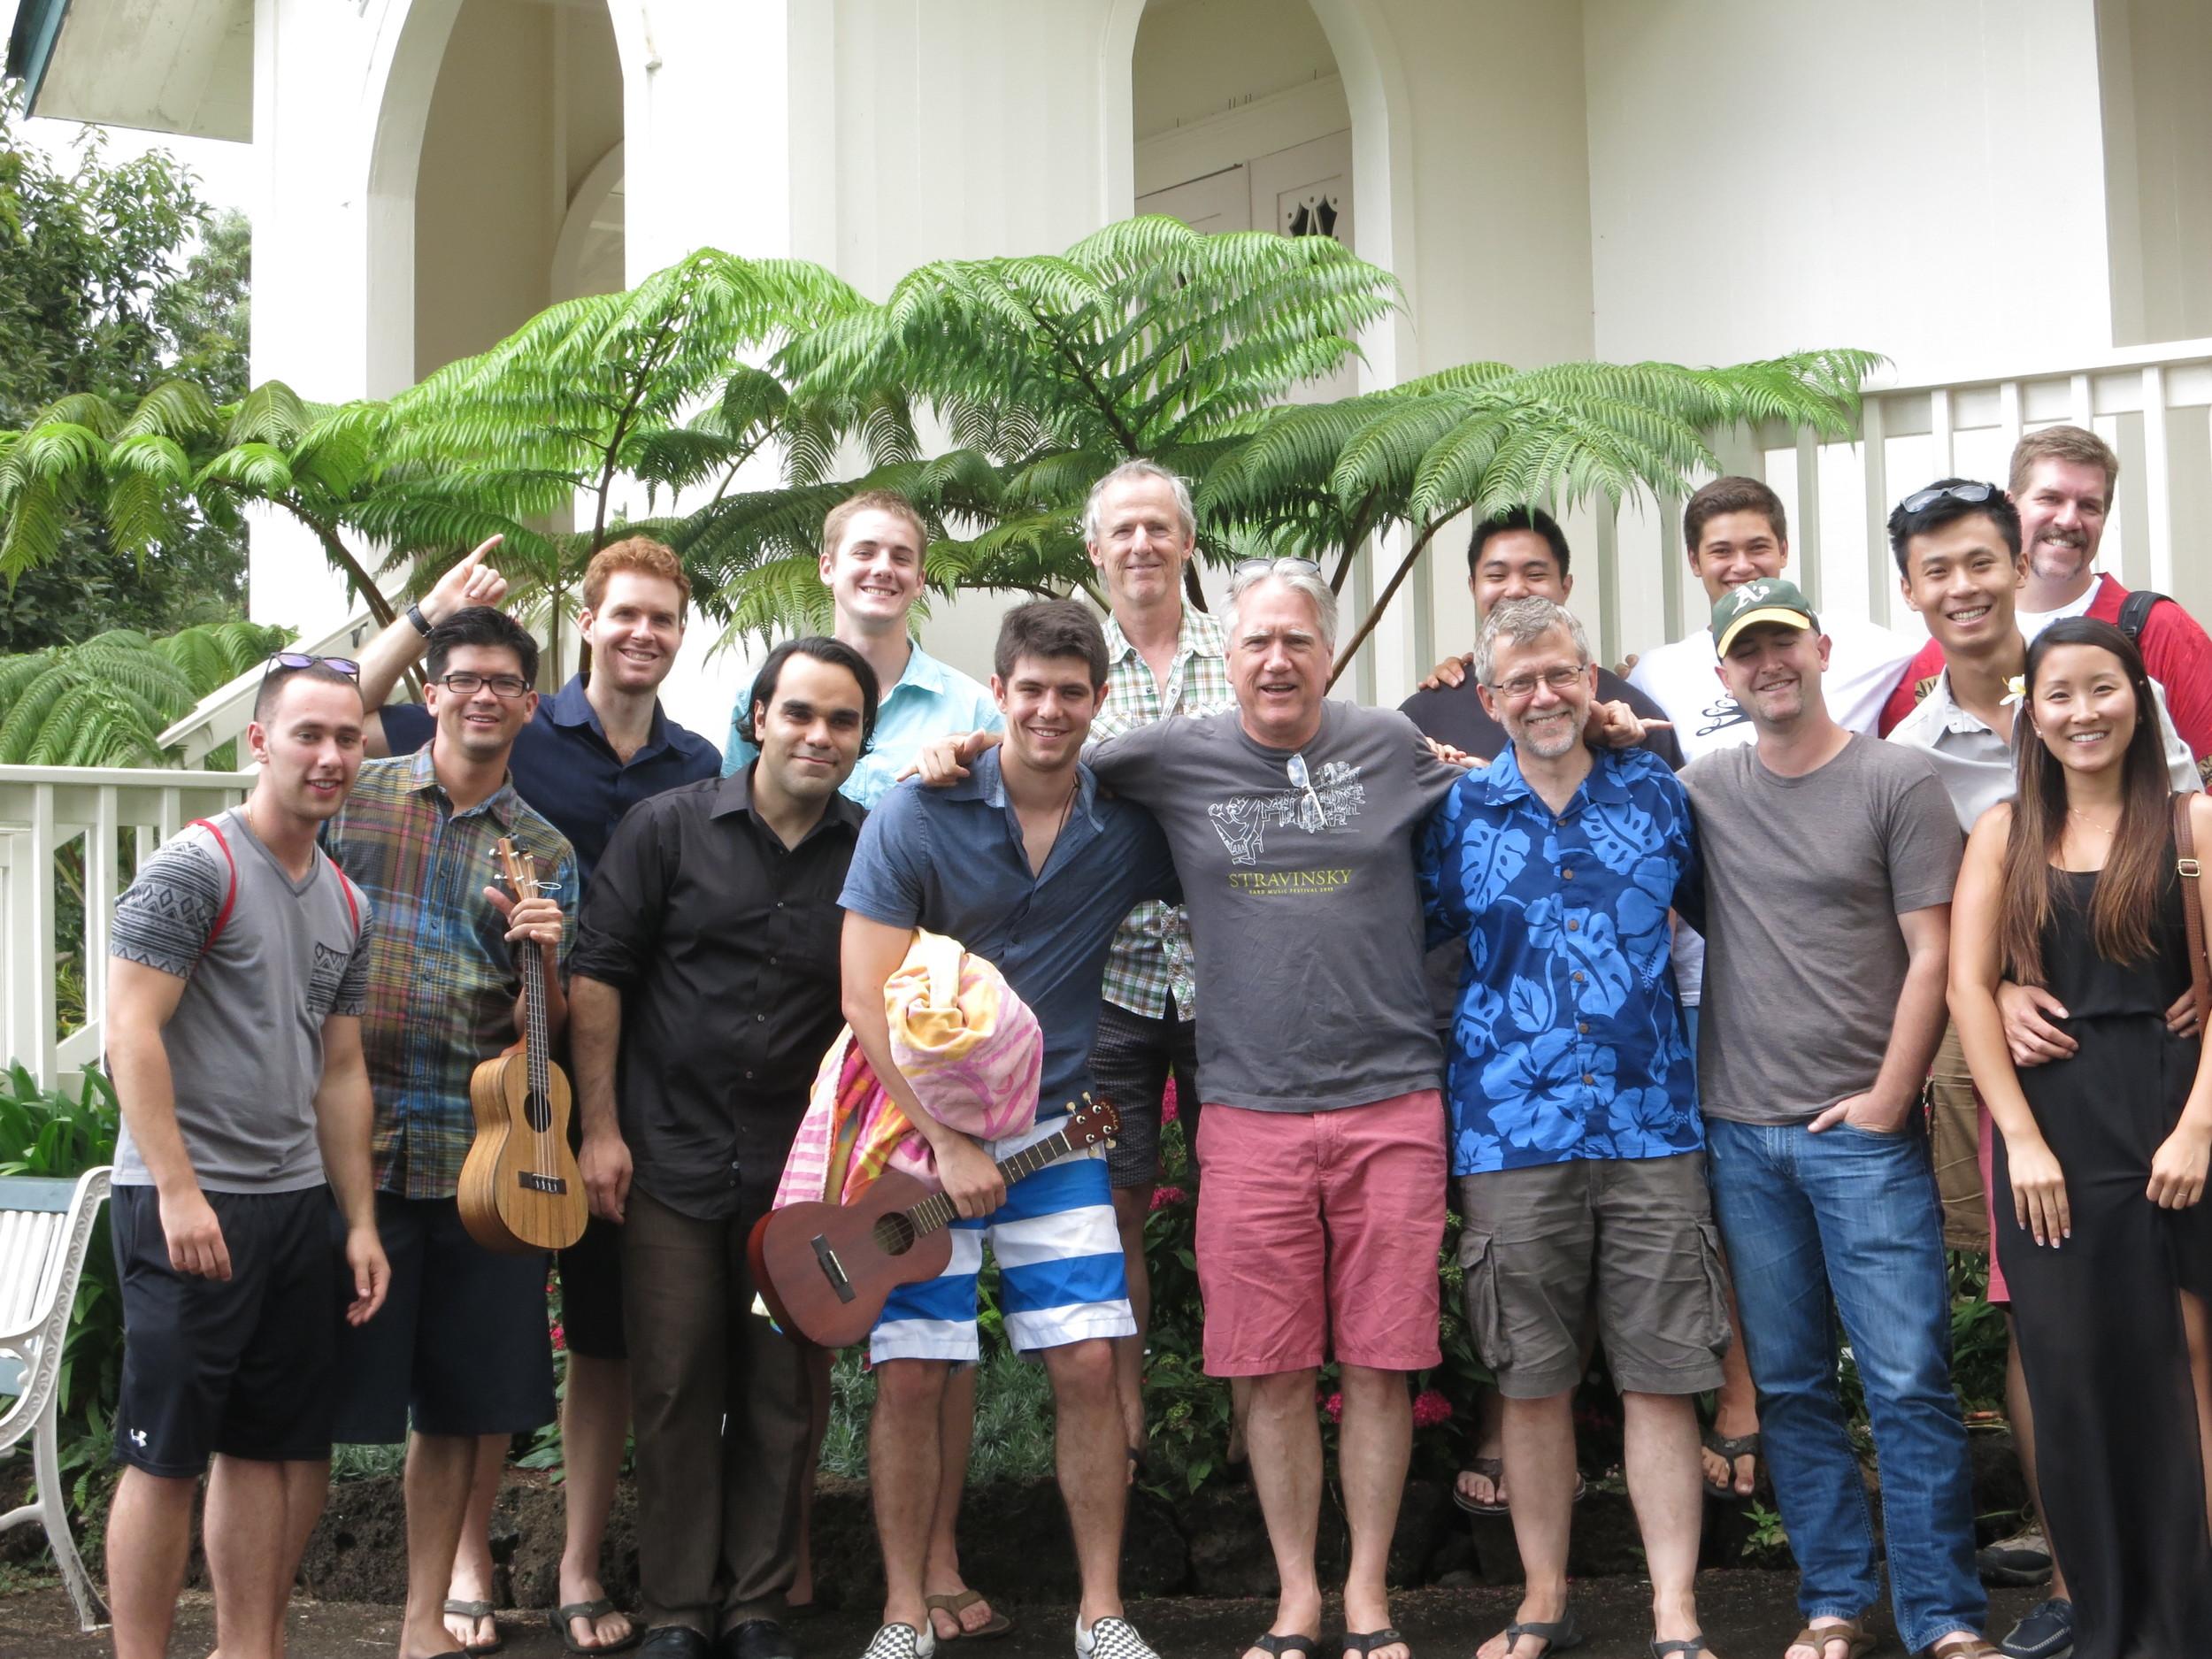 2014 class members after concert at St. John's Church in Kula